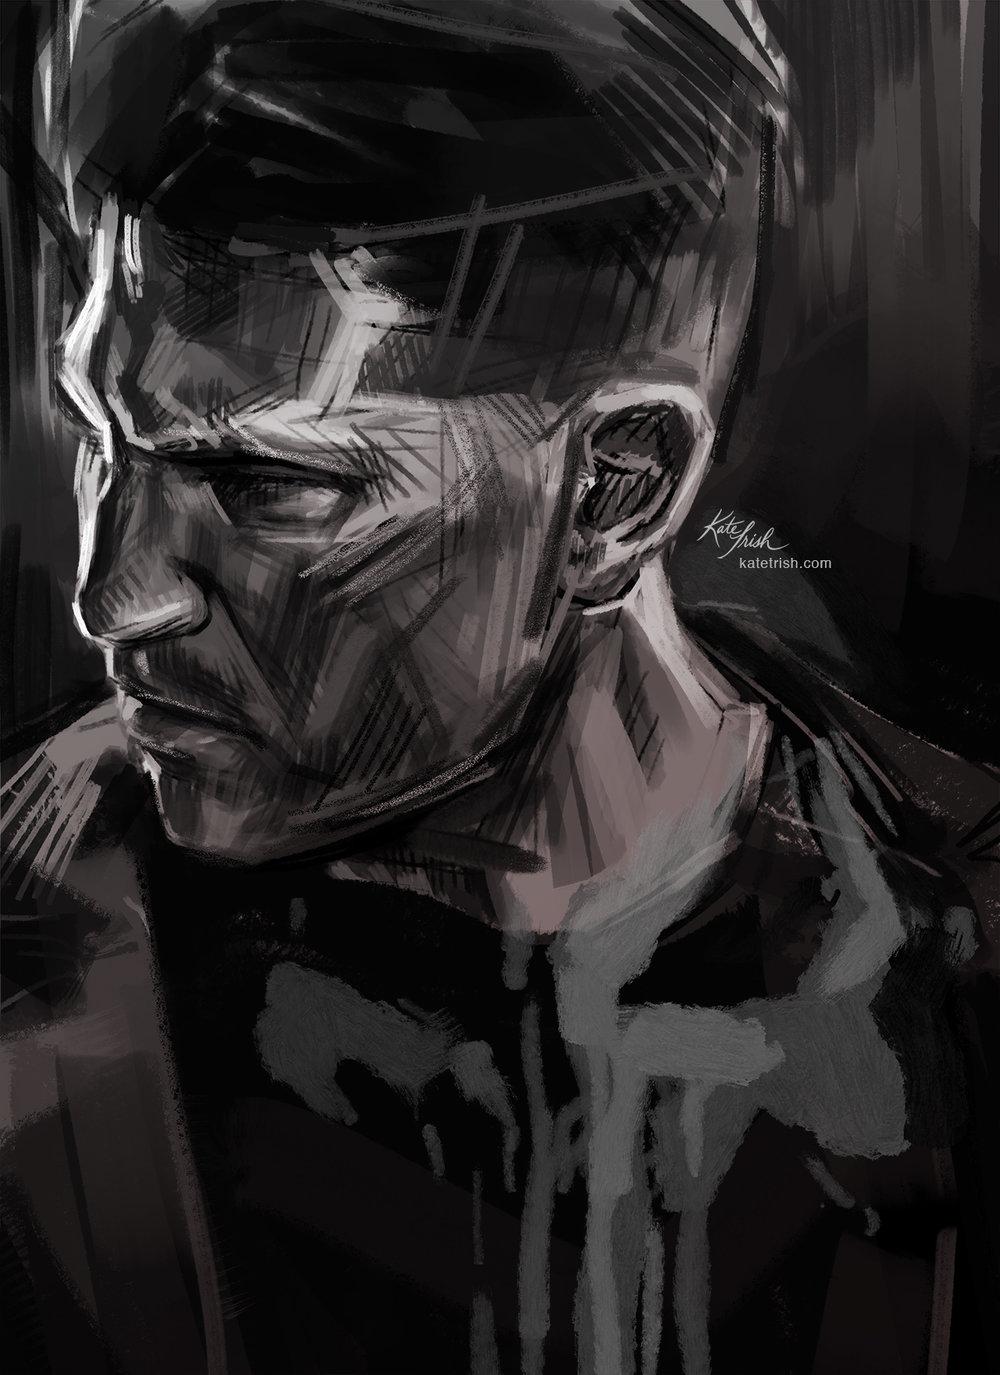 Jon Bernthal as Frank Castle (The Punisher, Netflix)